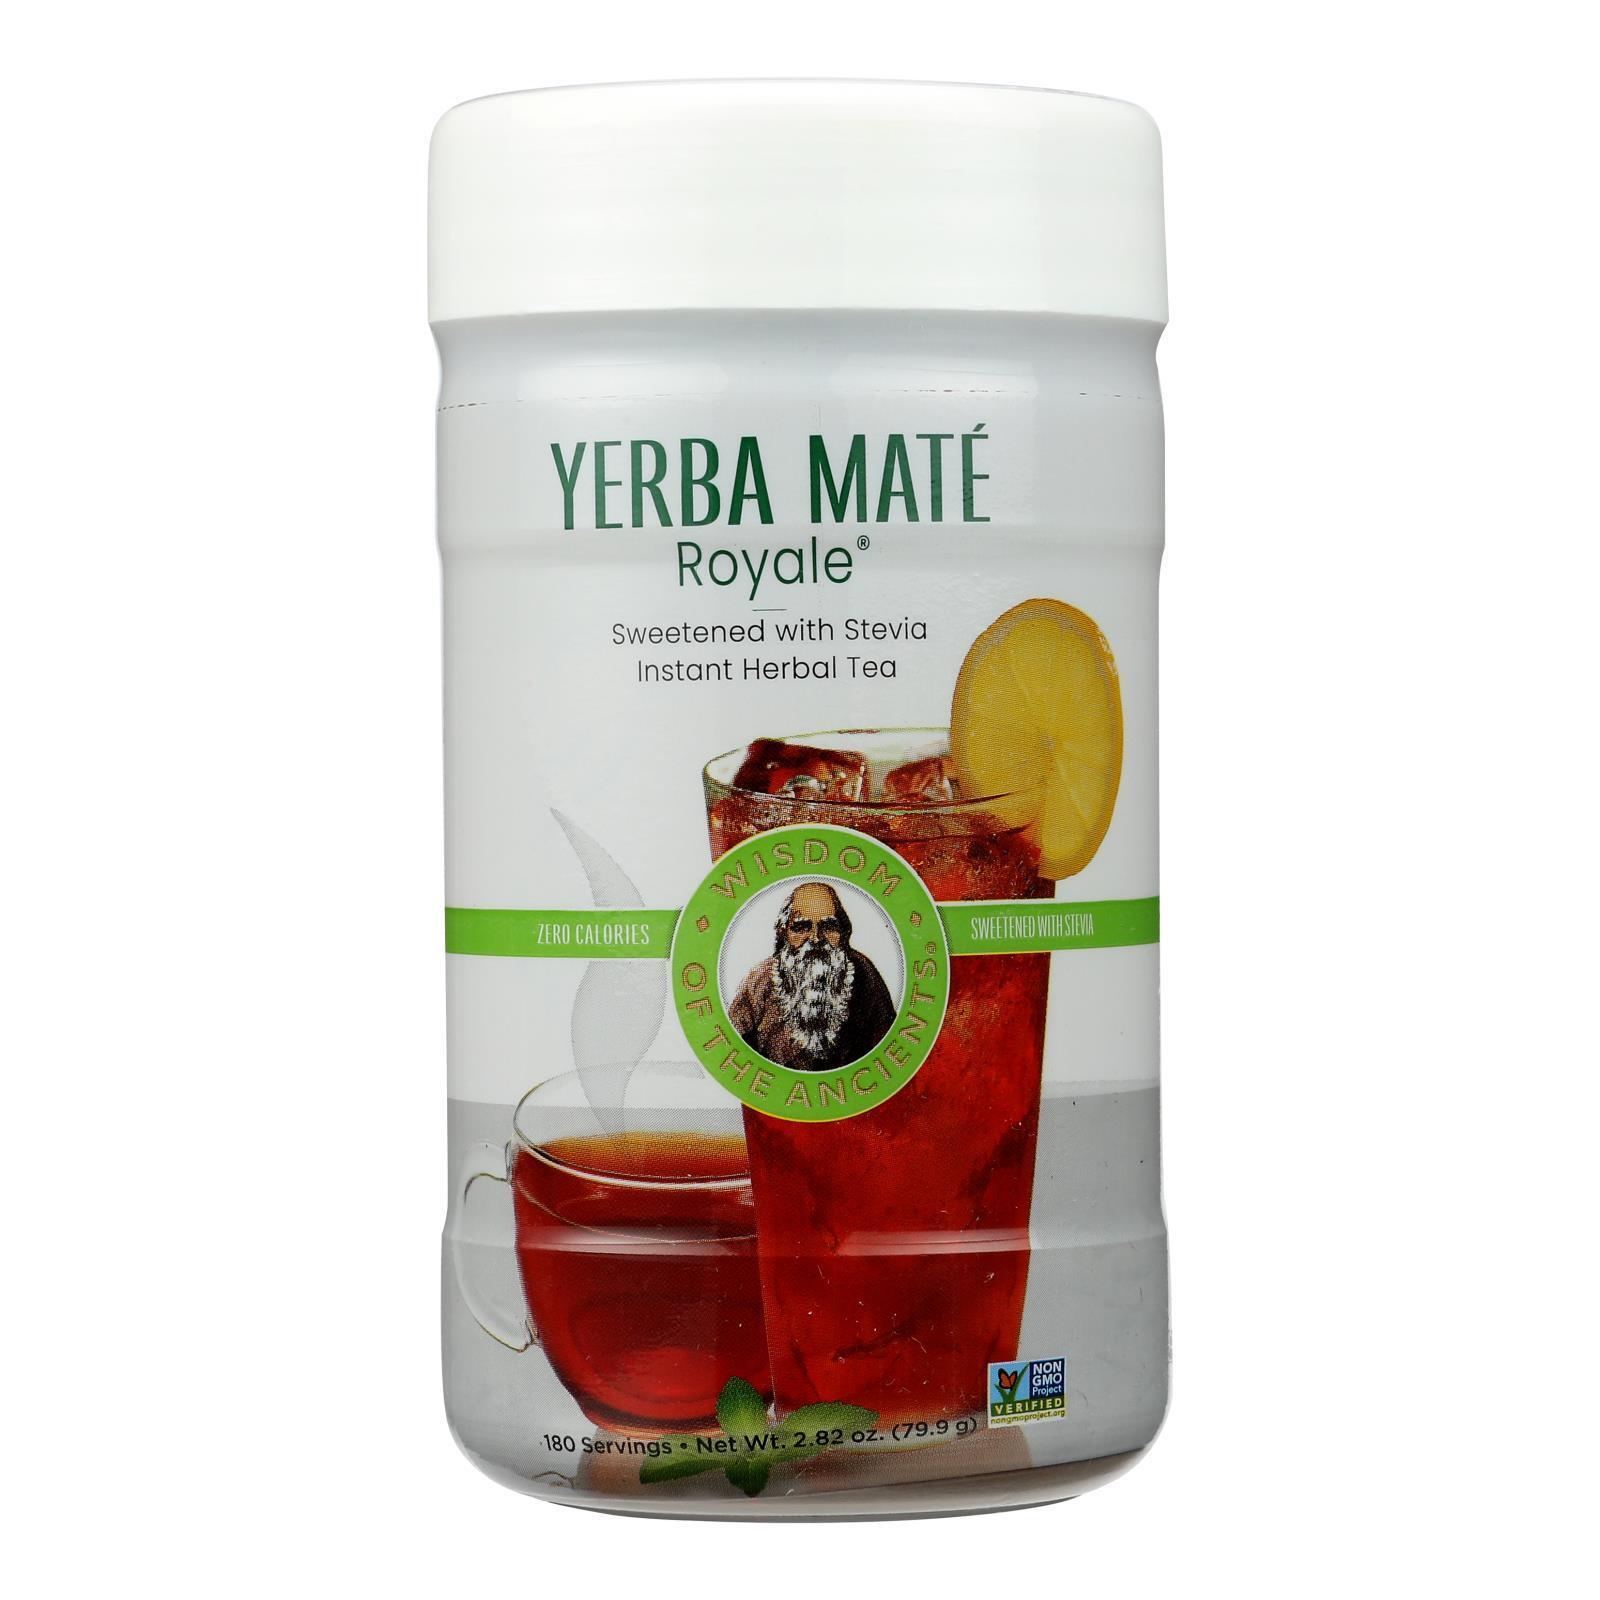 Wisdom Natural Organic Yerba Mate Royale Tea - 2.82 oz